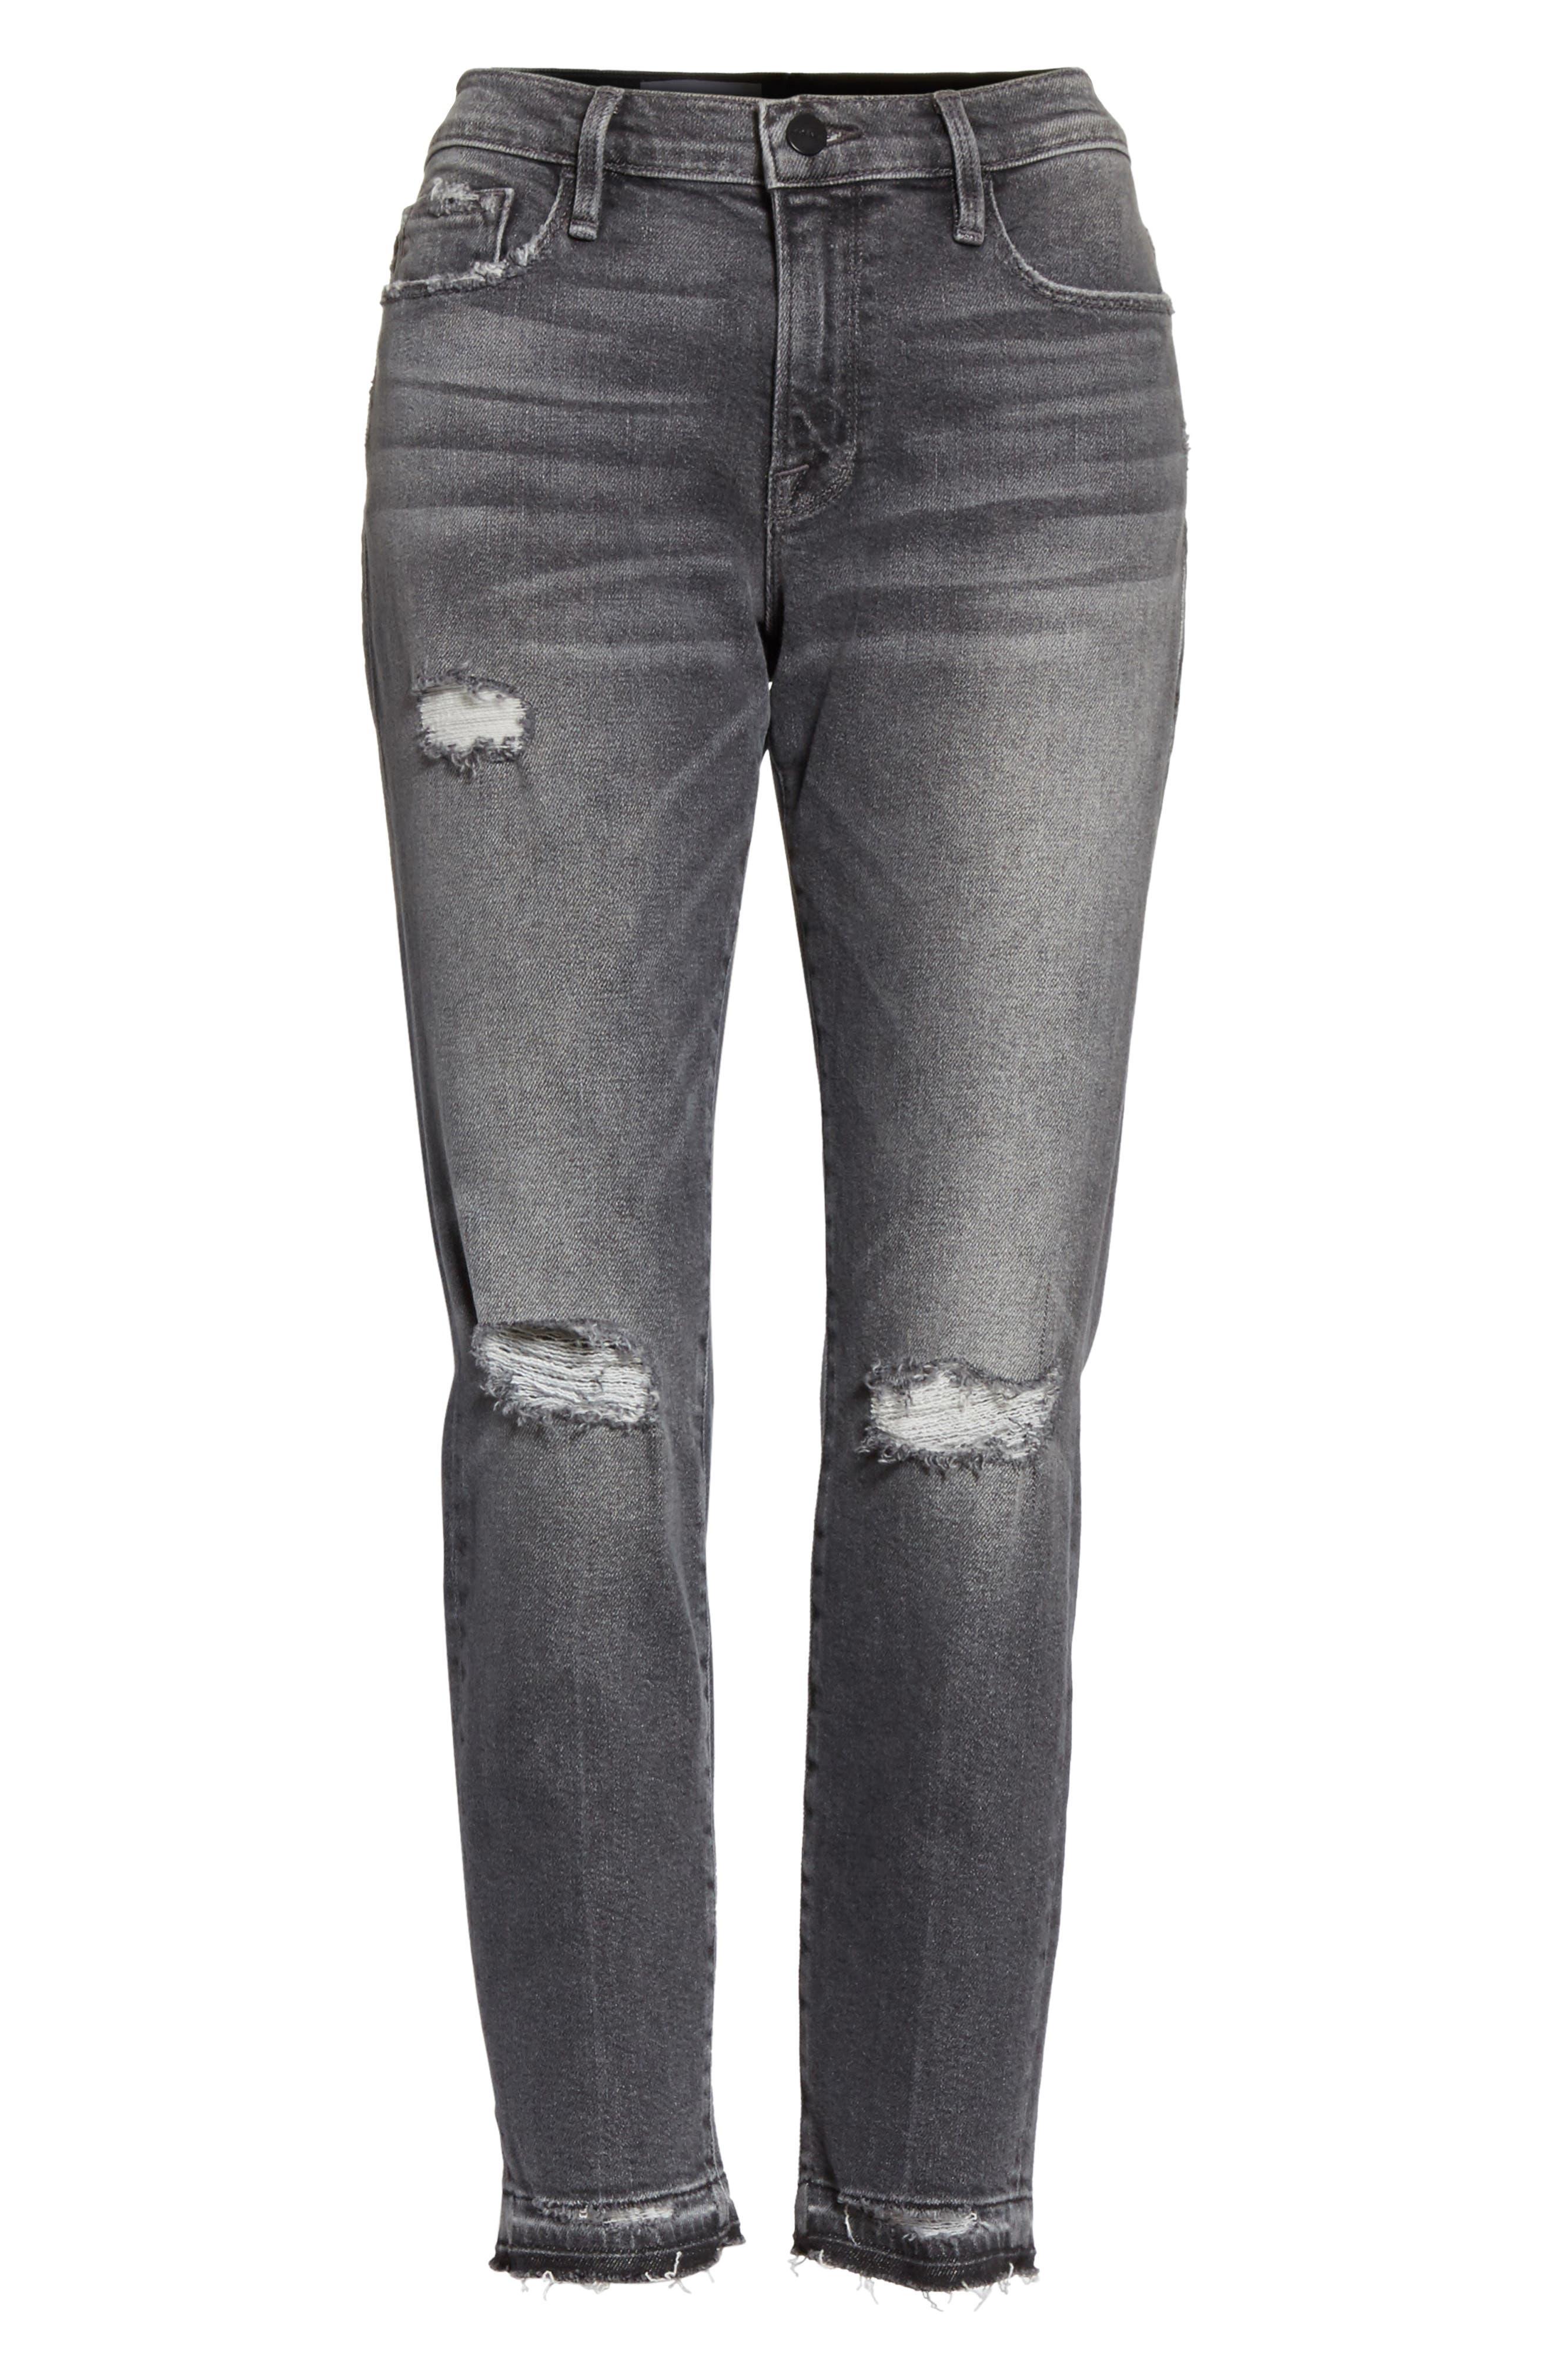 Le Garçon Ripped Released Hem Slim Jeans,                             Alternate thumbnail 7, color,                             Stockcross